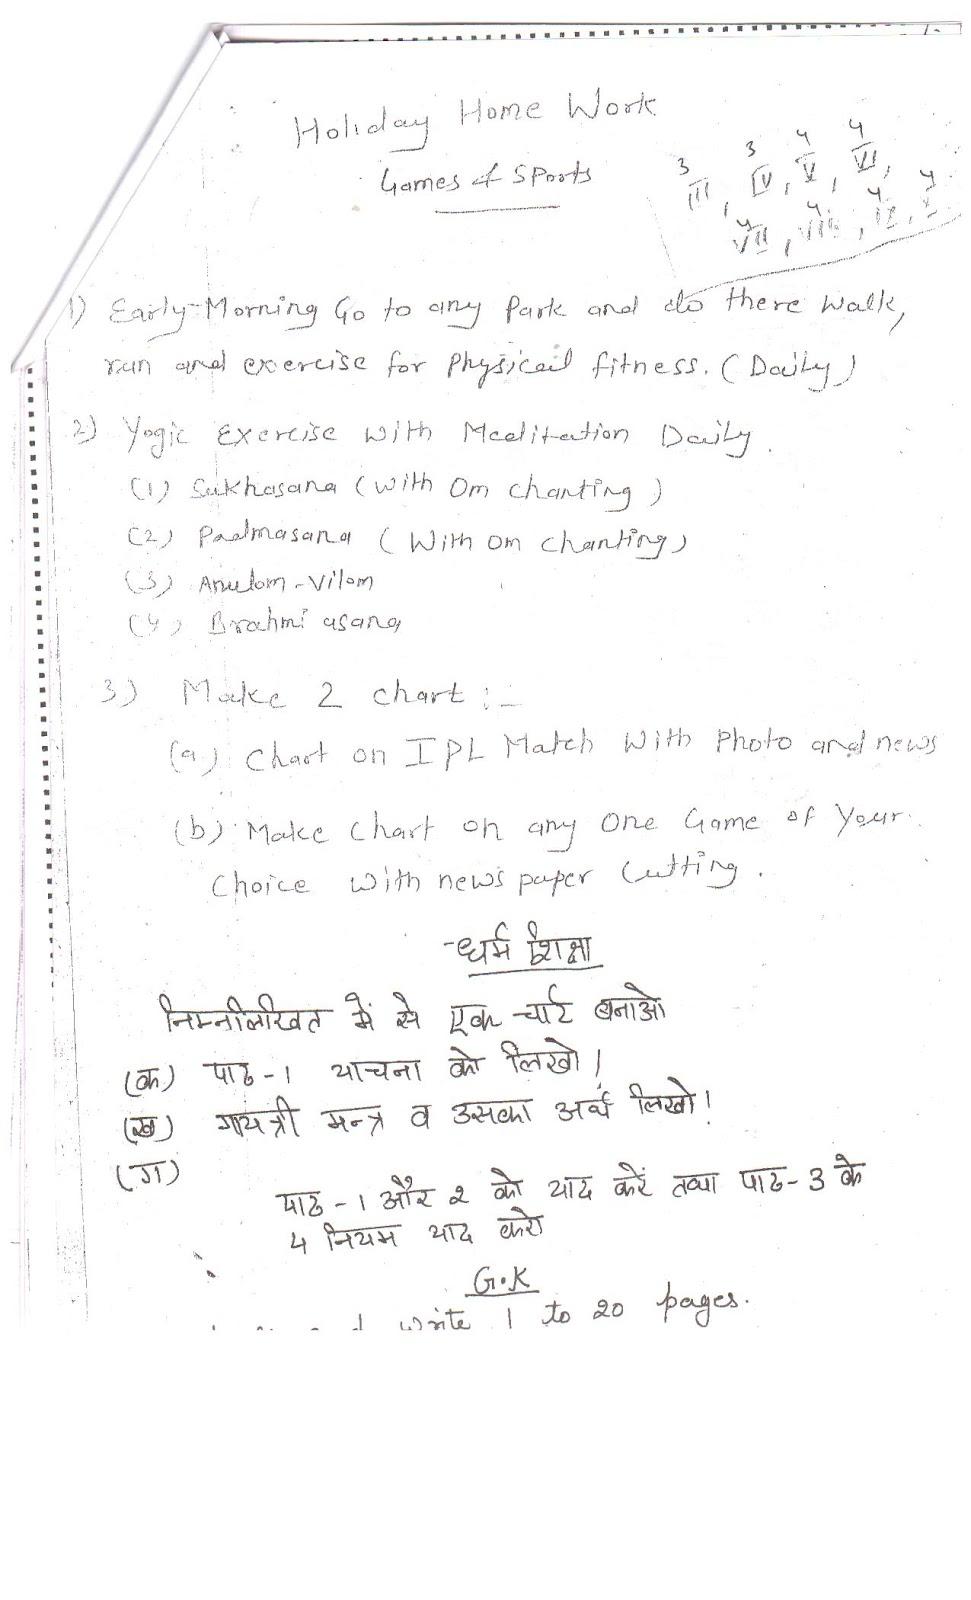 Sanctuary school lynda barry essay